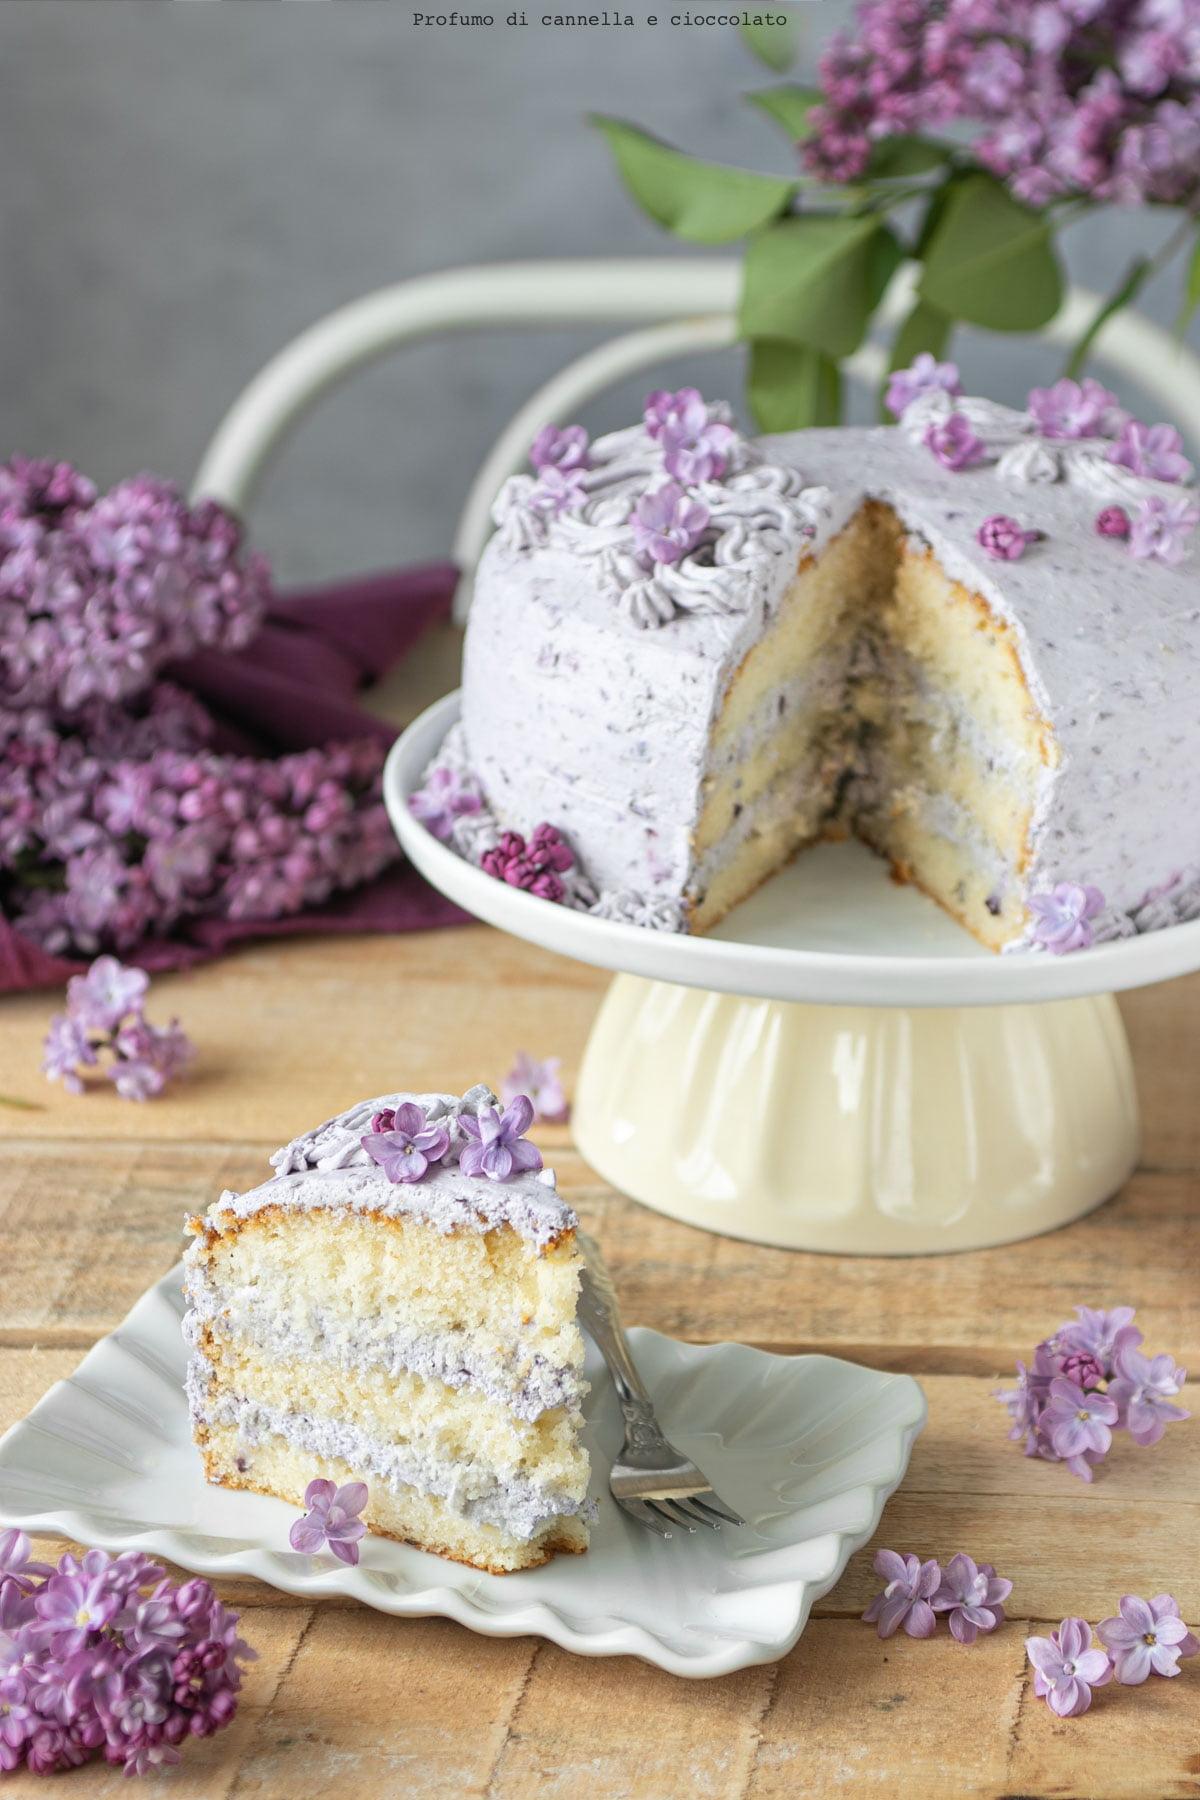 Ricetta torta farcita panna e mirtilli.